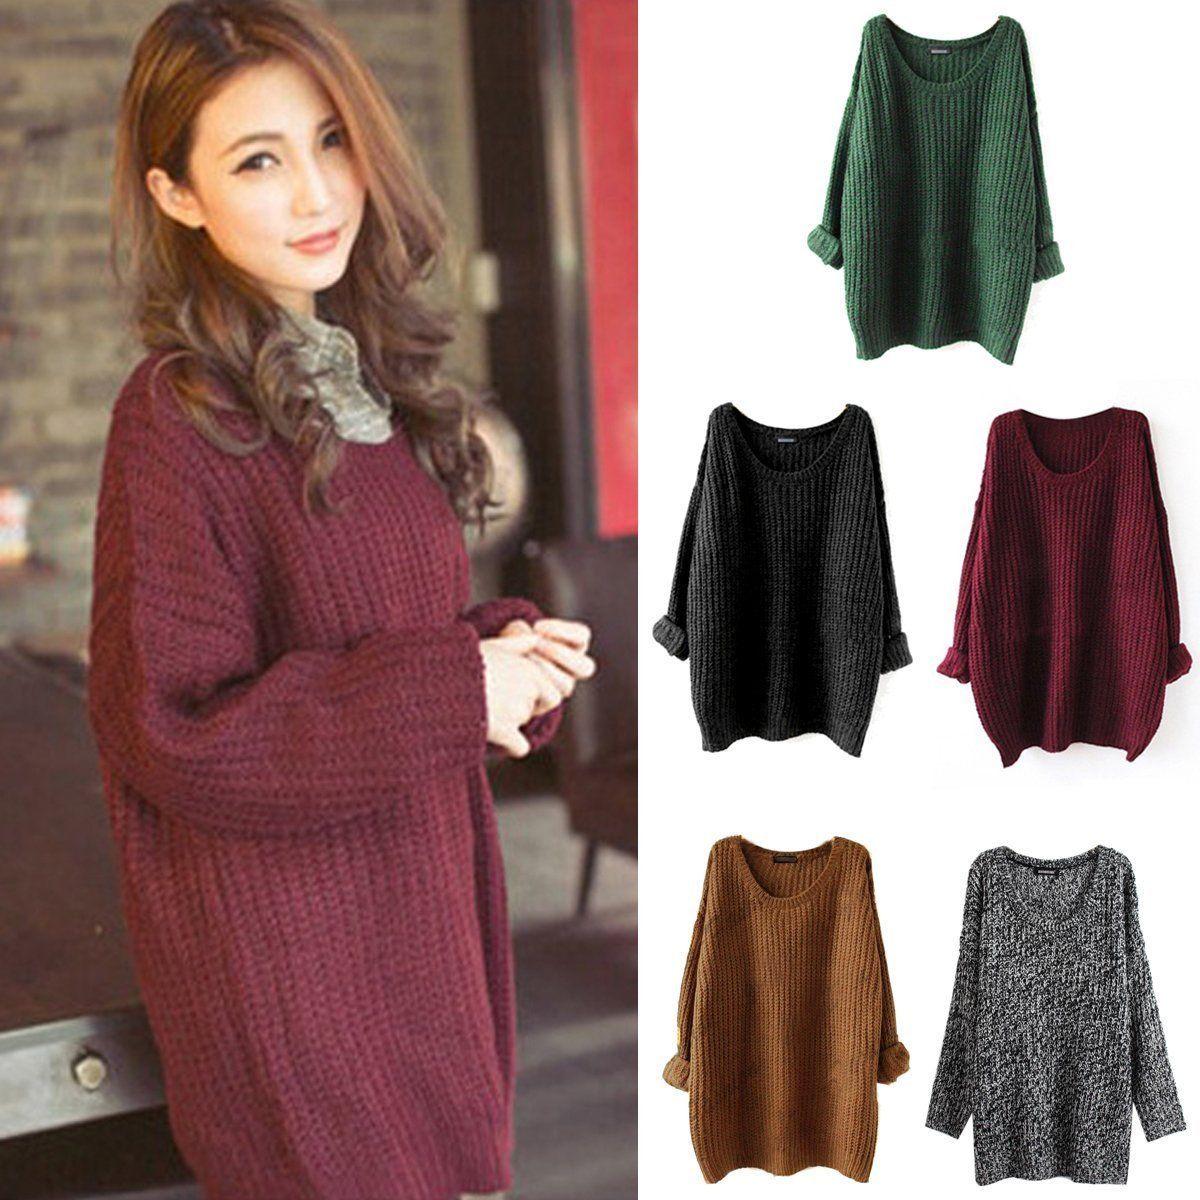 c4bb842f84fe Women Oversized Loose Long Sleeve Knitted Sweater Jumper Cardigan ...